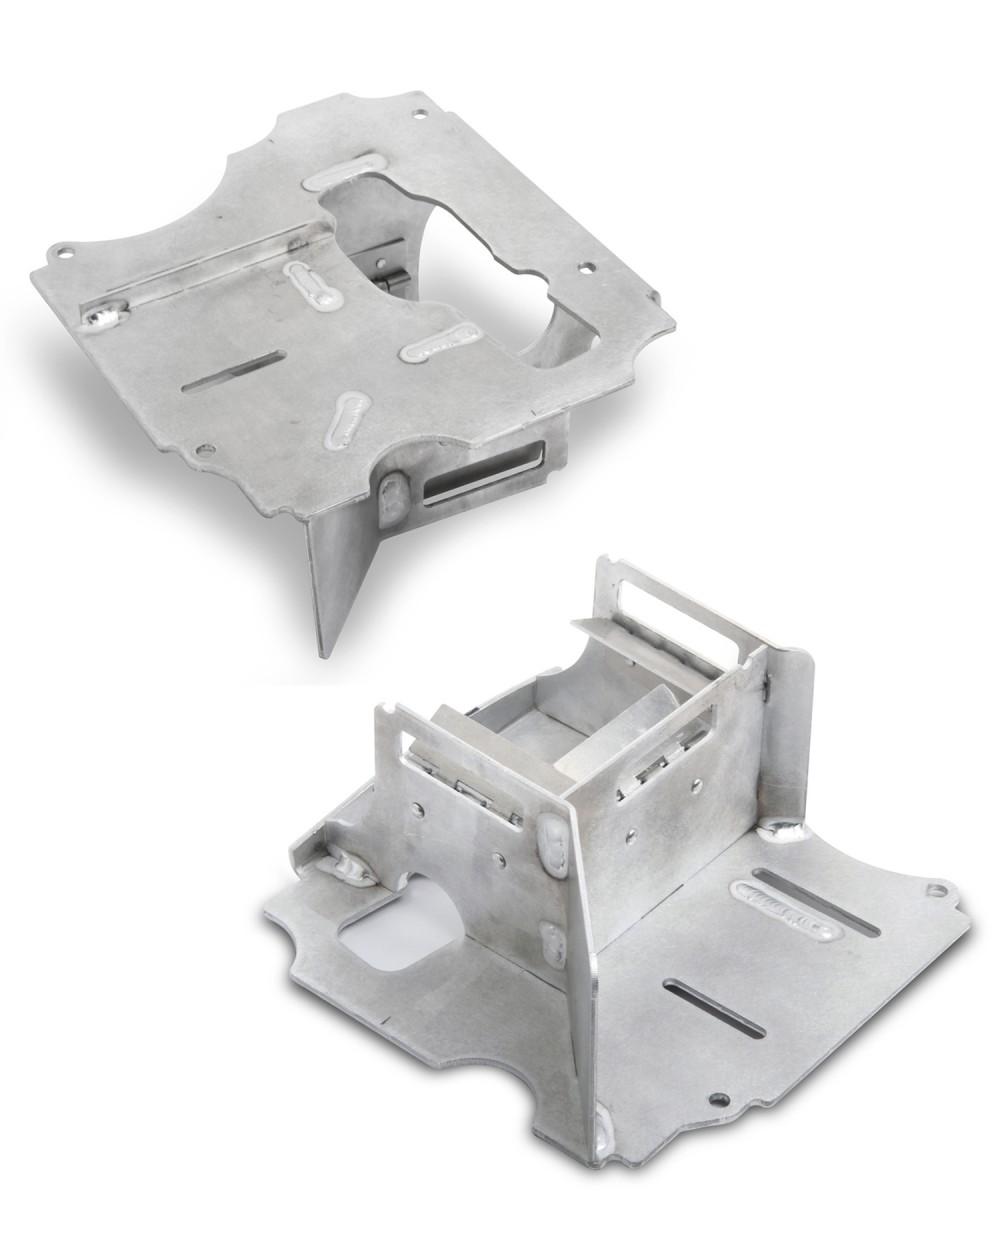 Oil-Pan-Baffle-Kit302-10